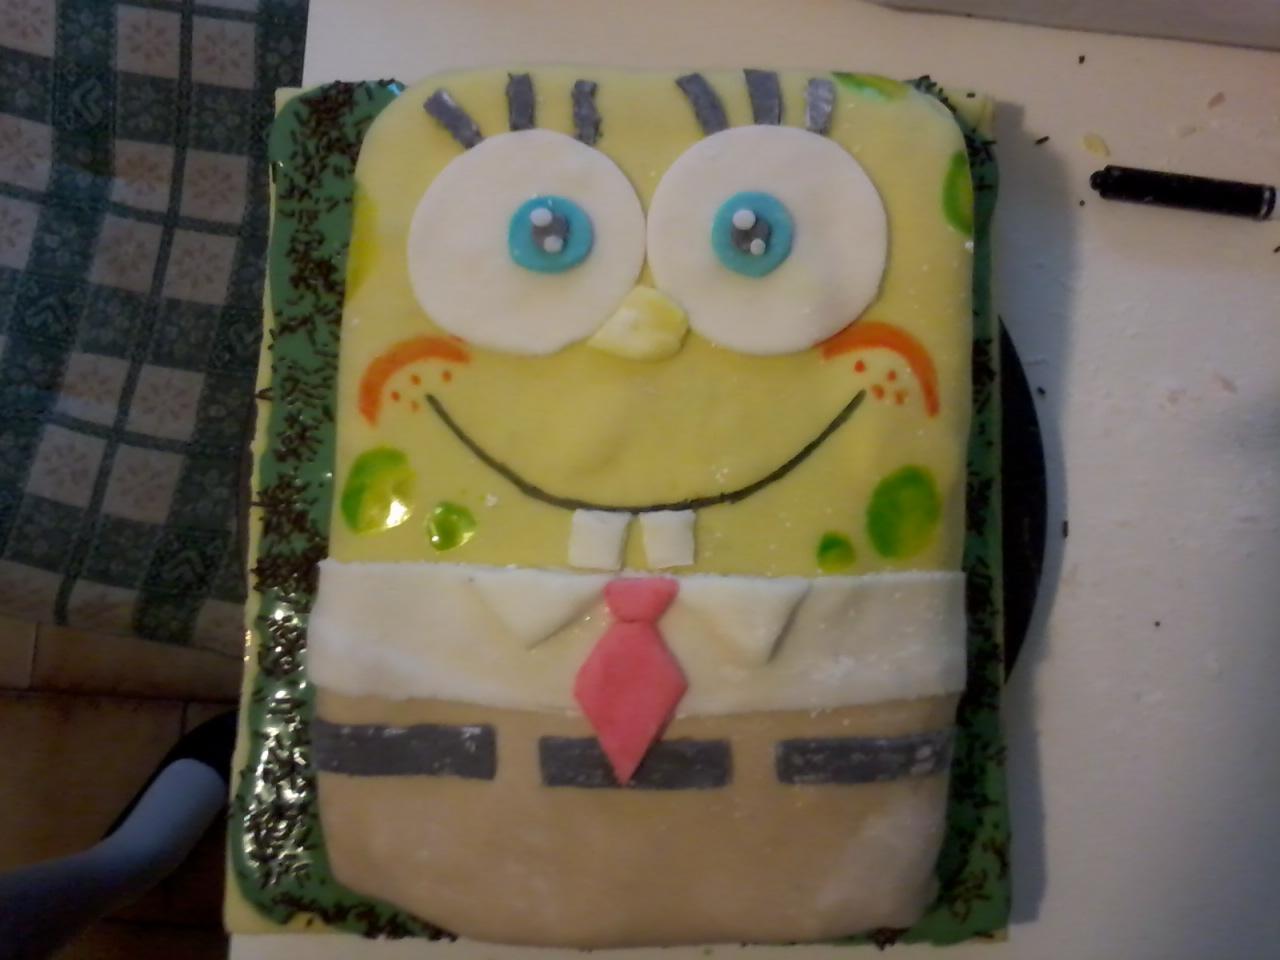 Torta spongebob la cucina di pasticcina for Isola cucina a forma di torta